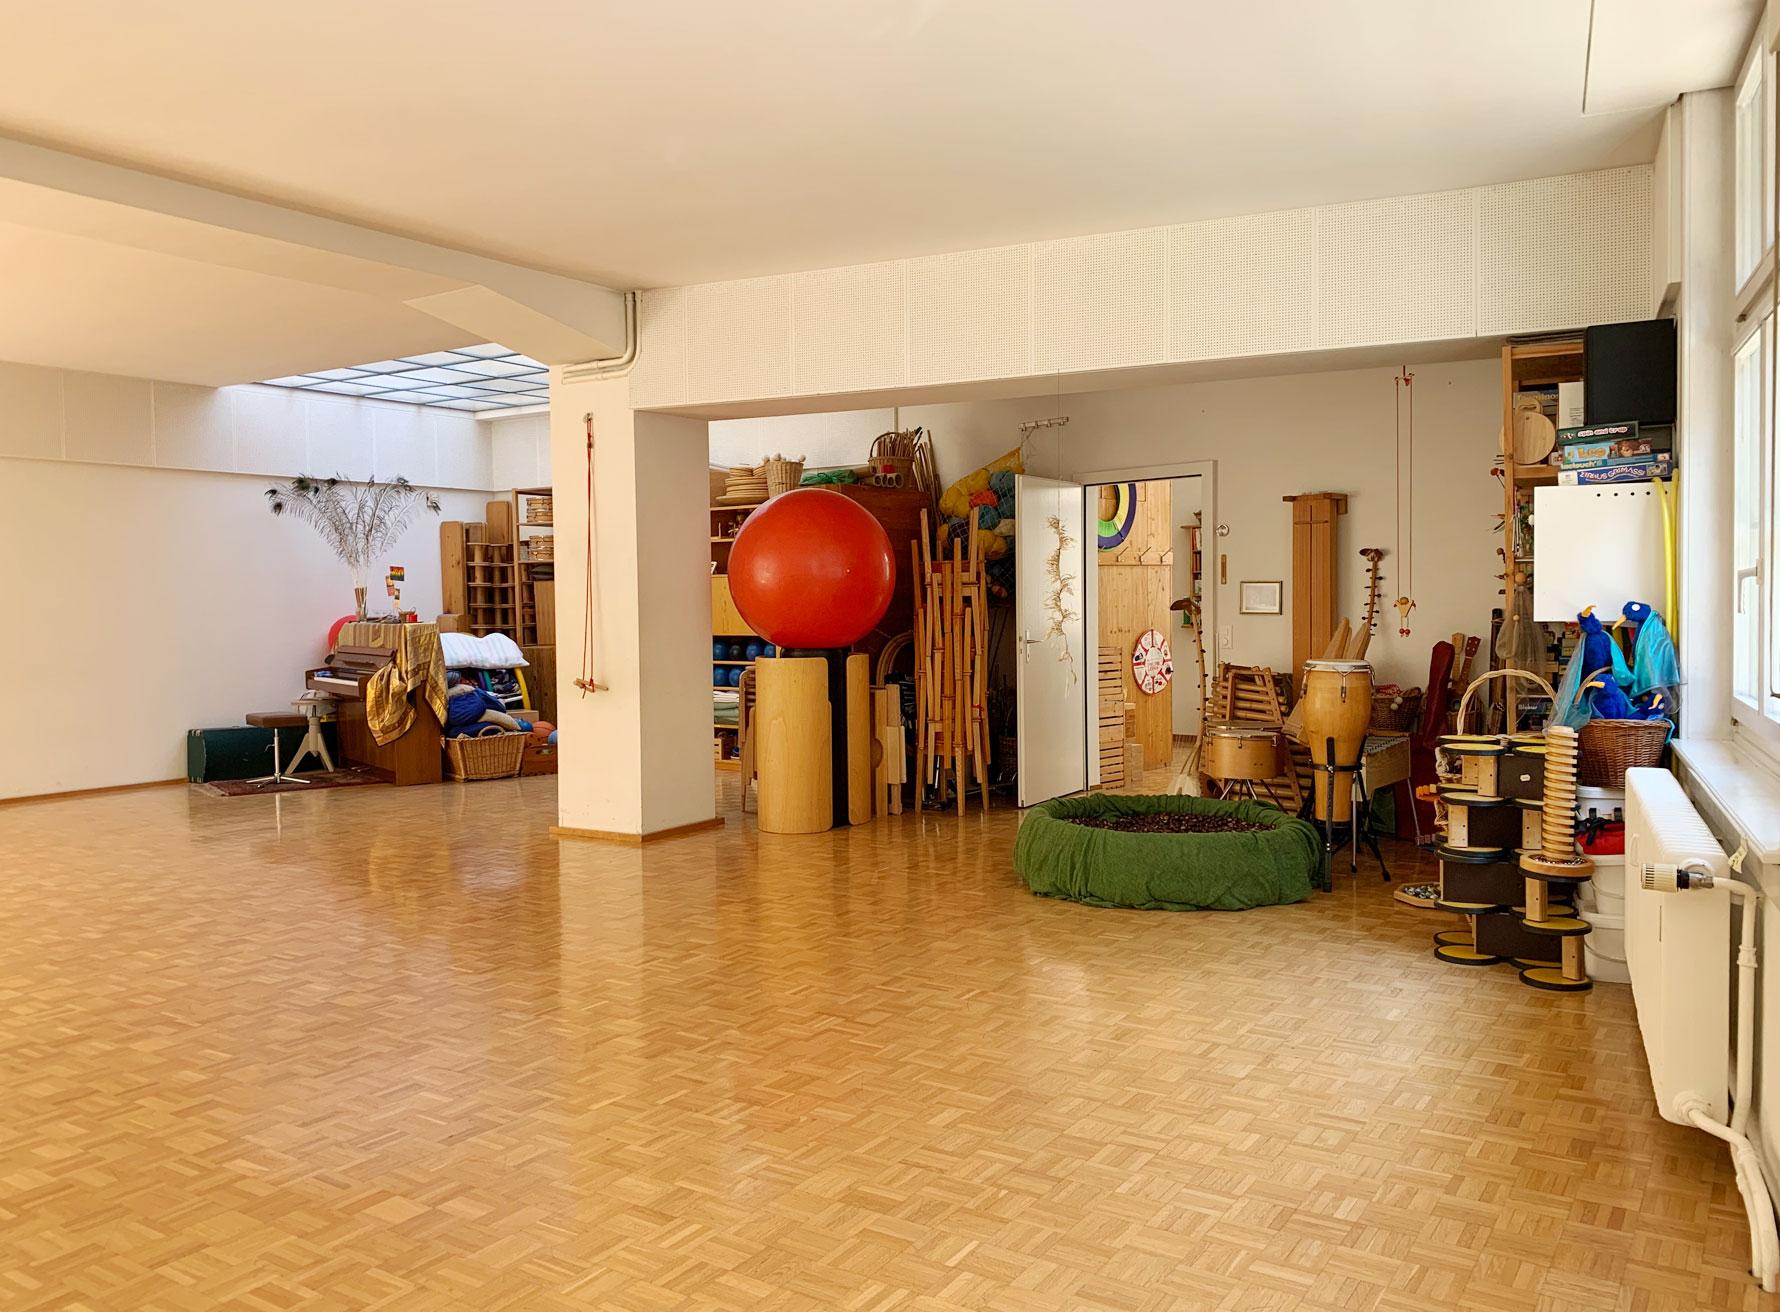 Raum Bild 2